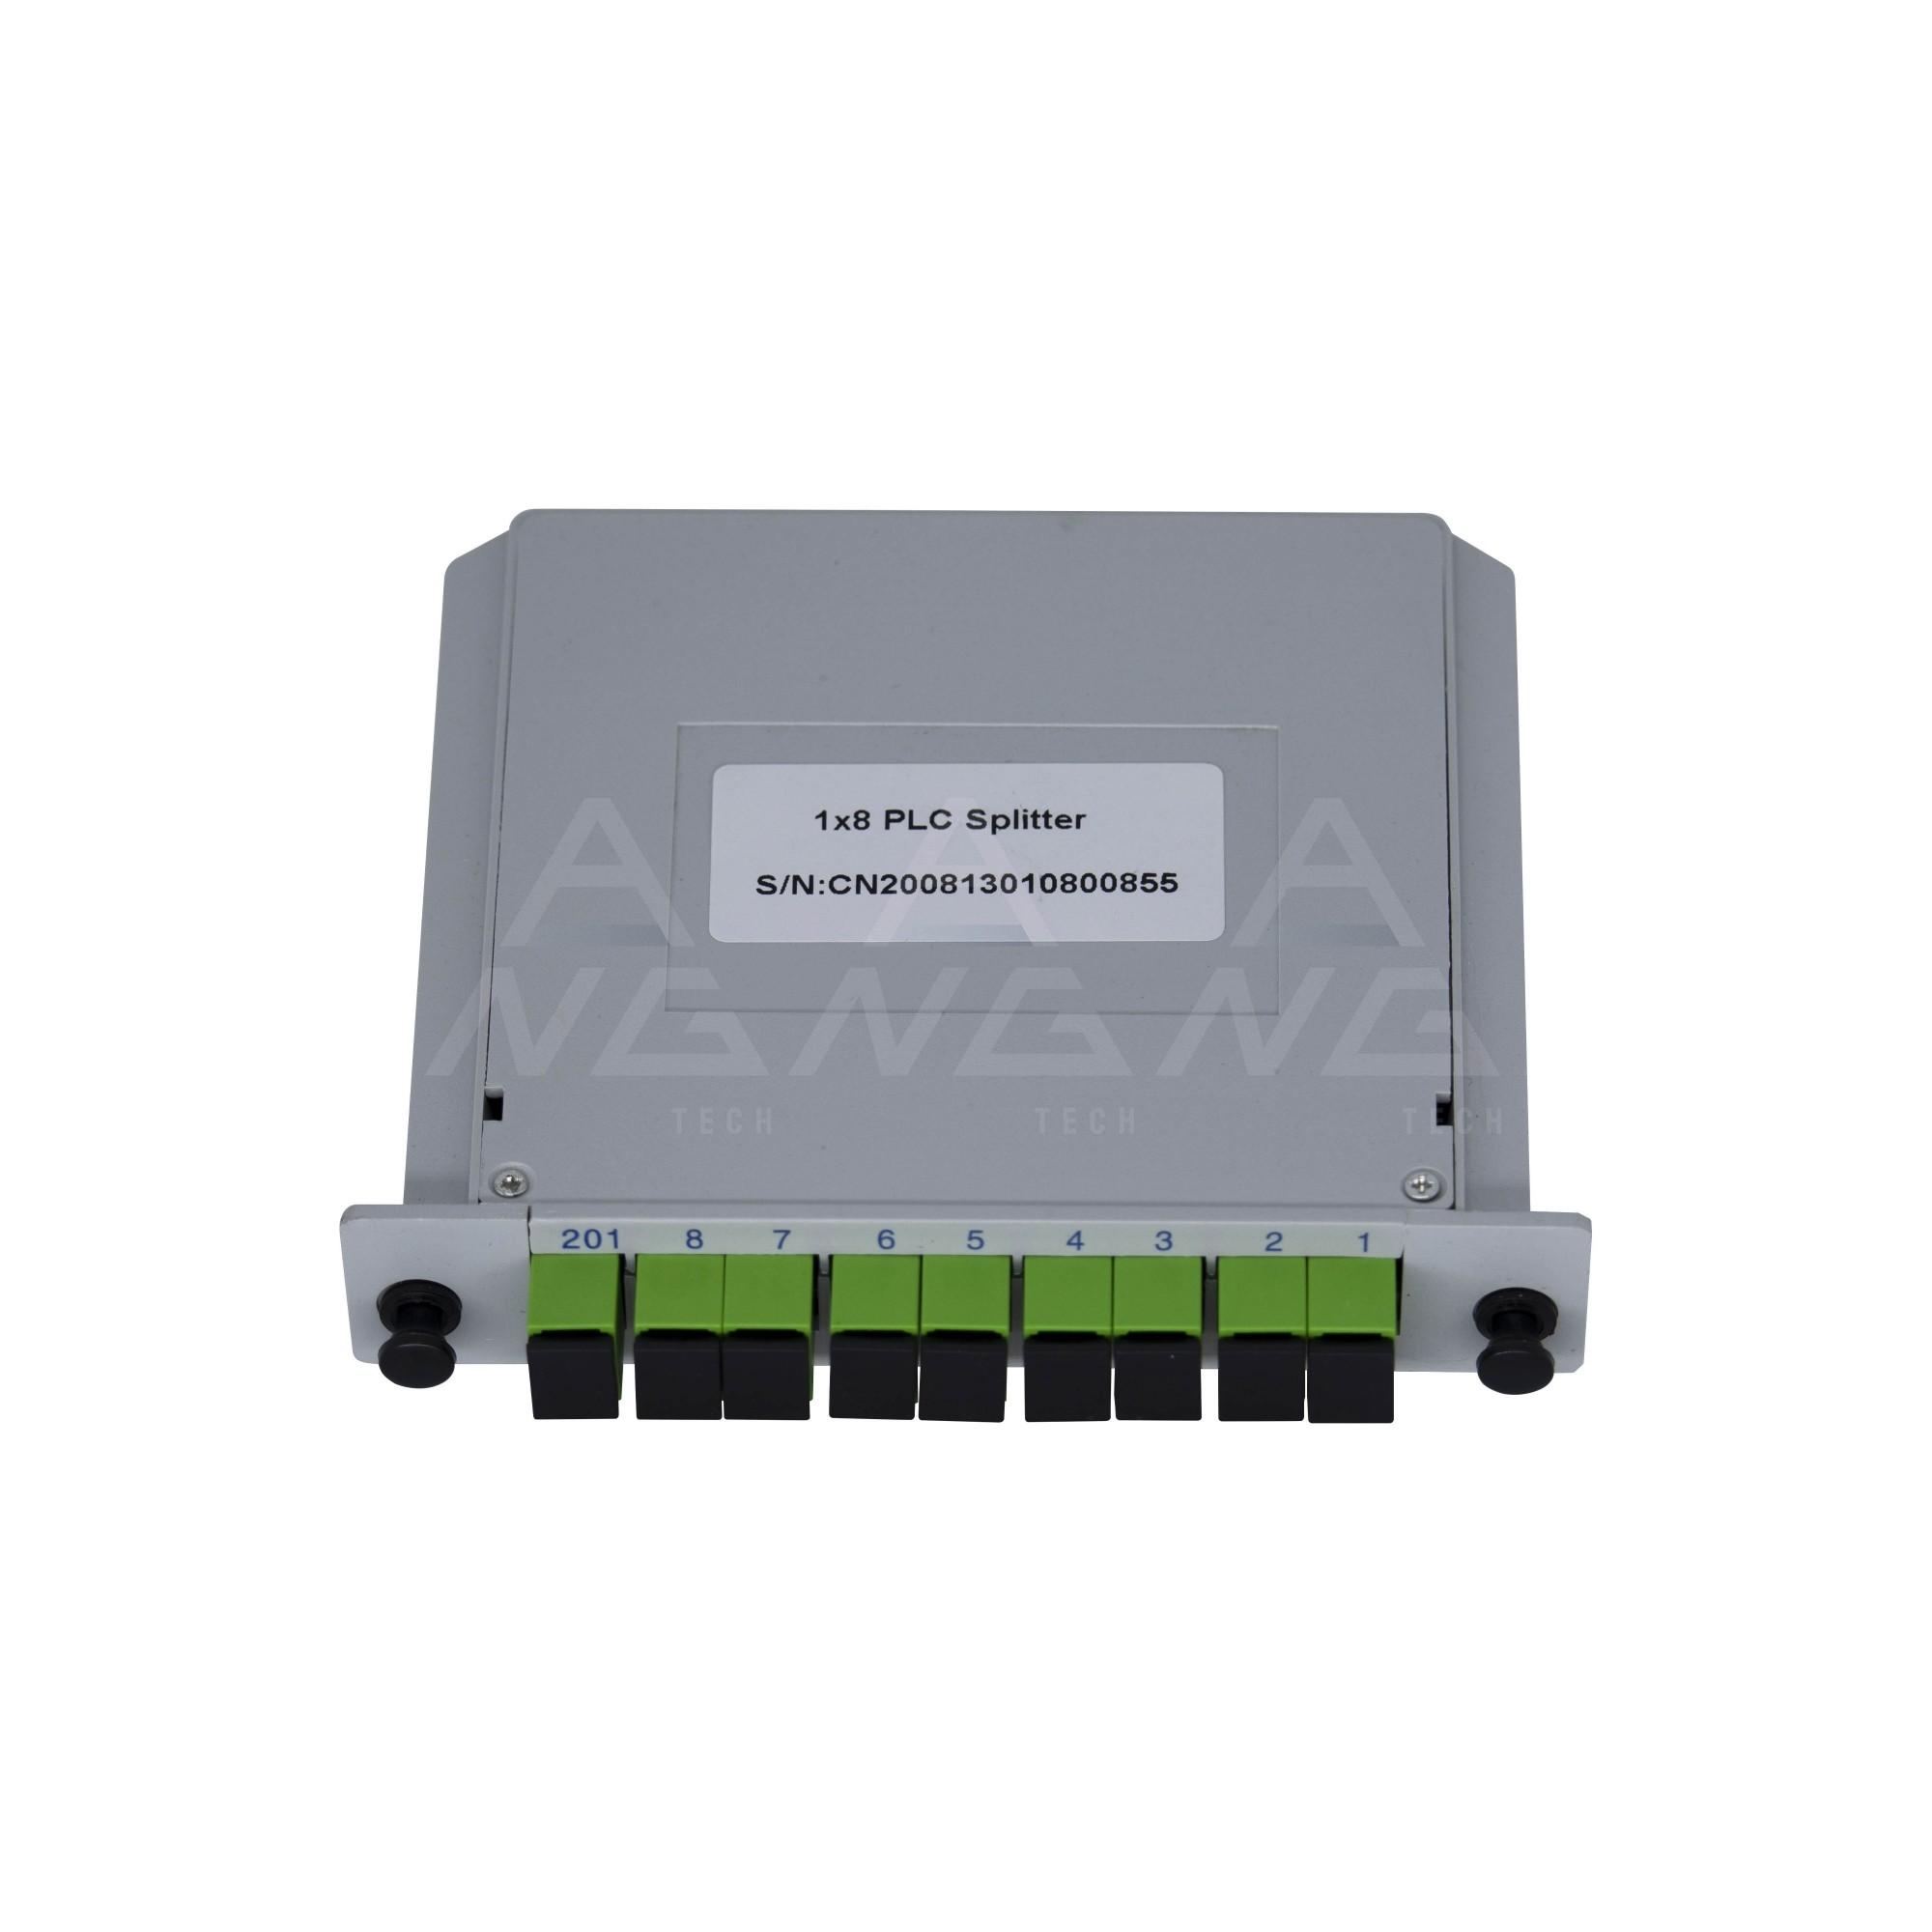 Splitter Cassete 1.8 com conector SC/APC - Modular